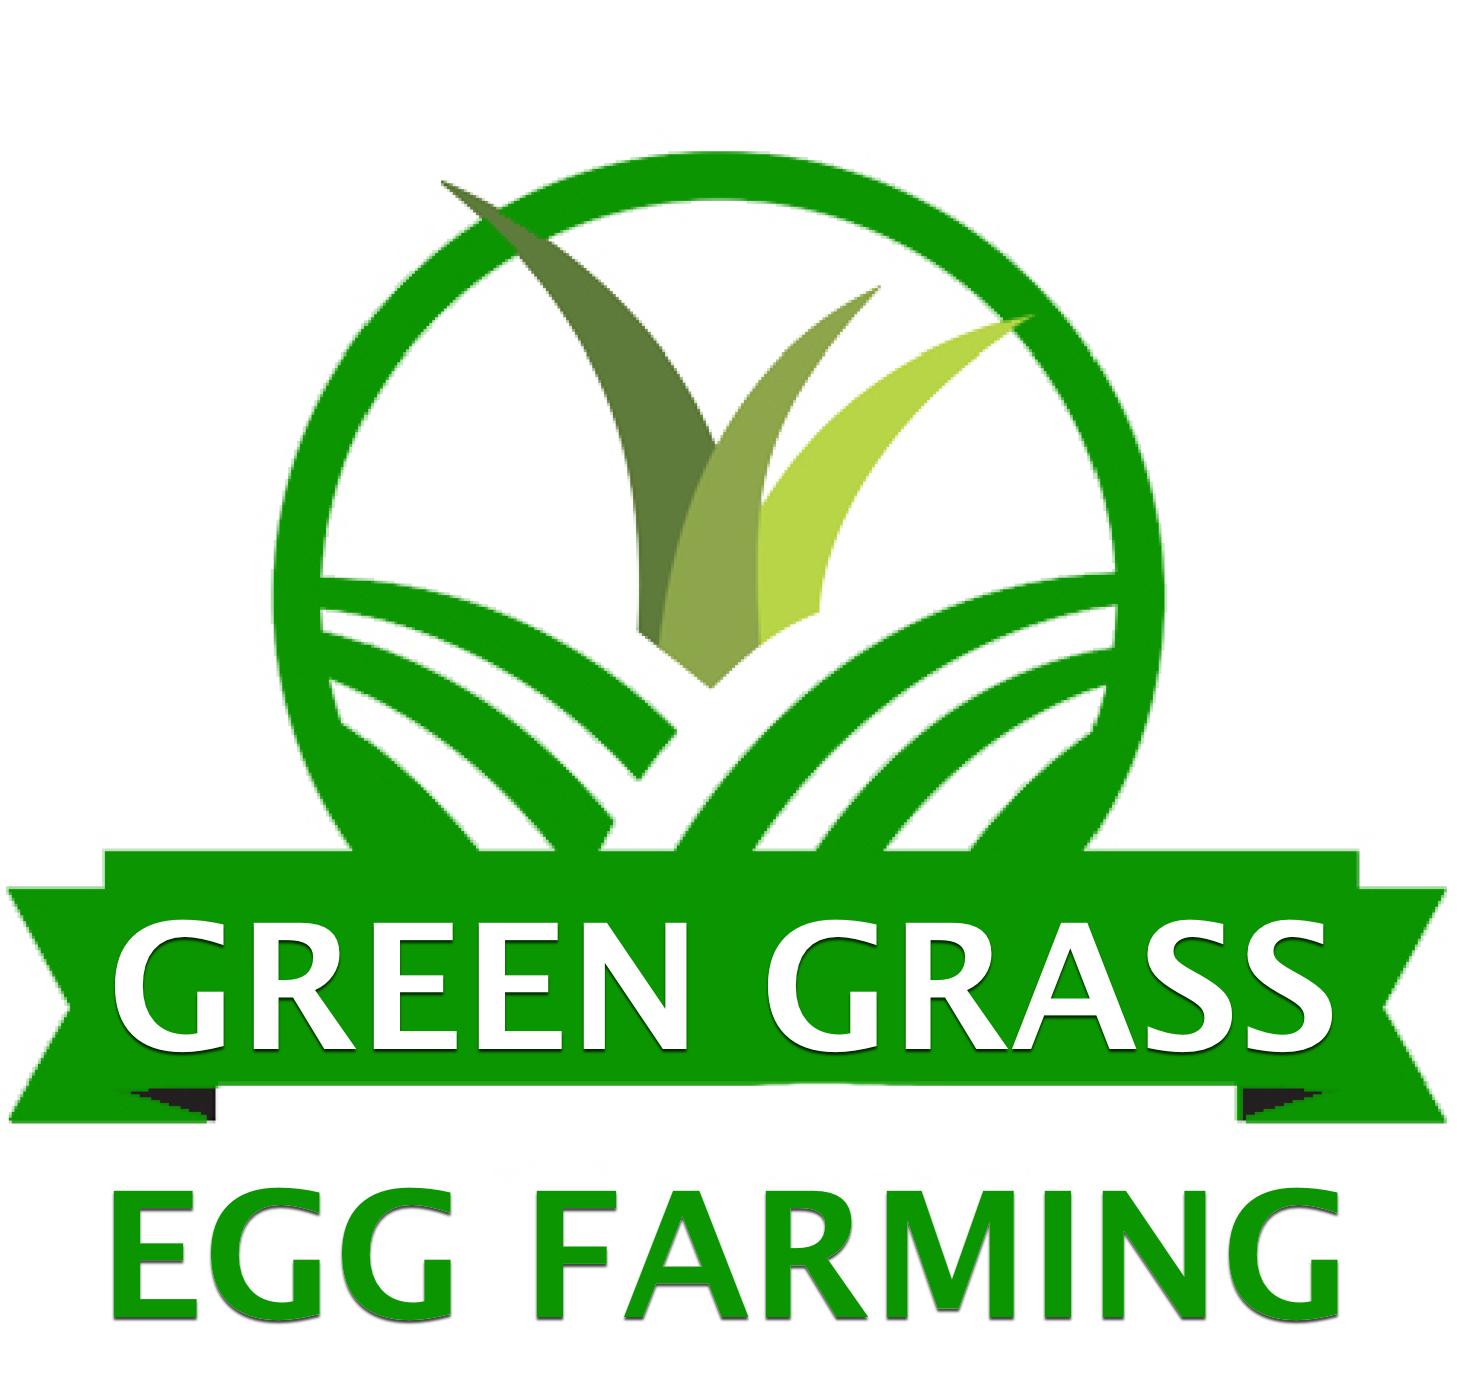 Green Grass Egg Farming